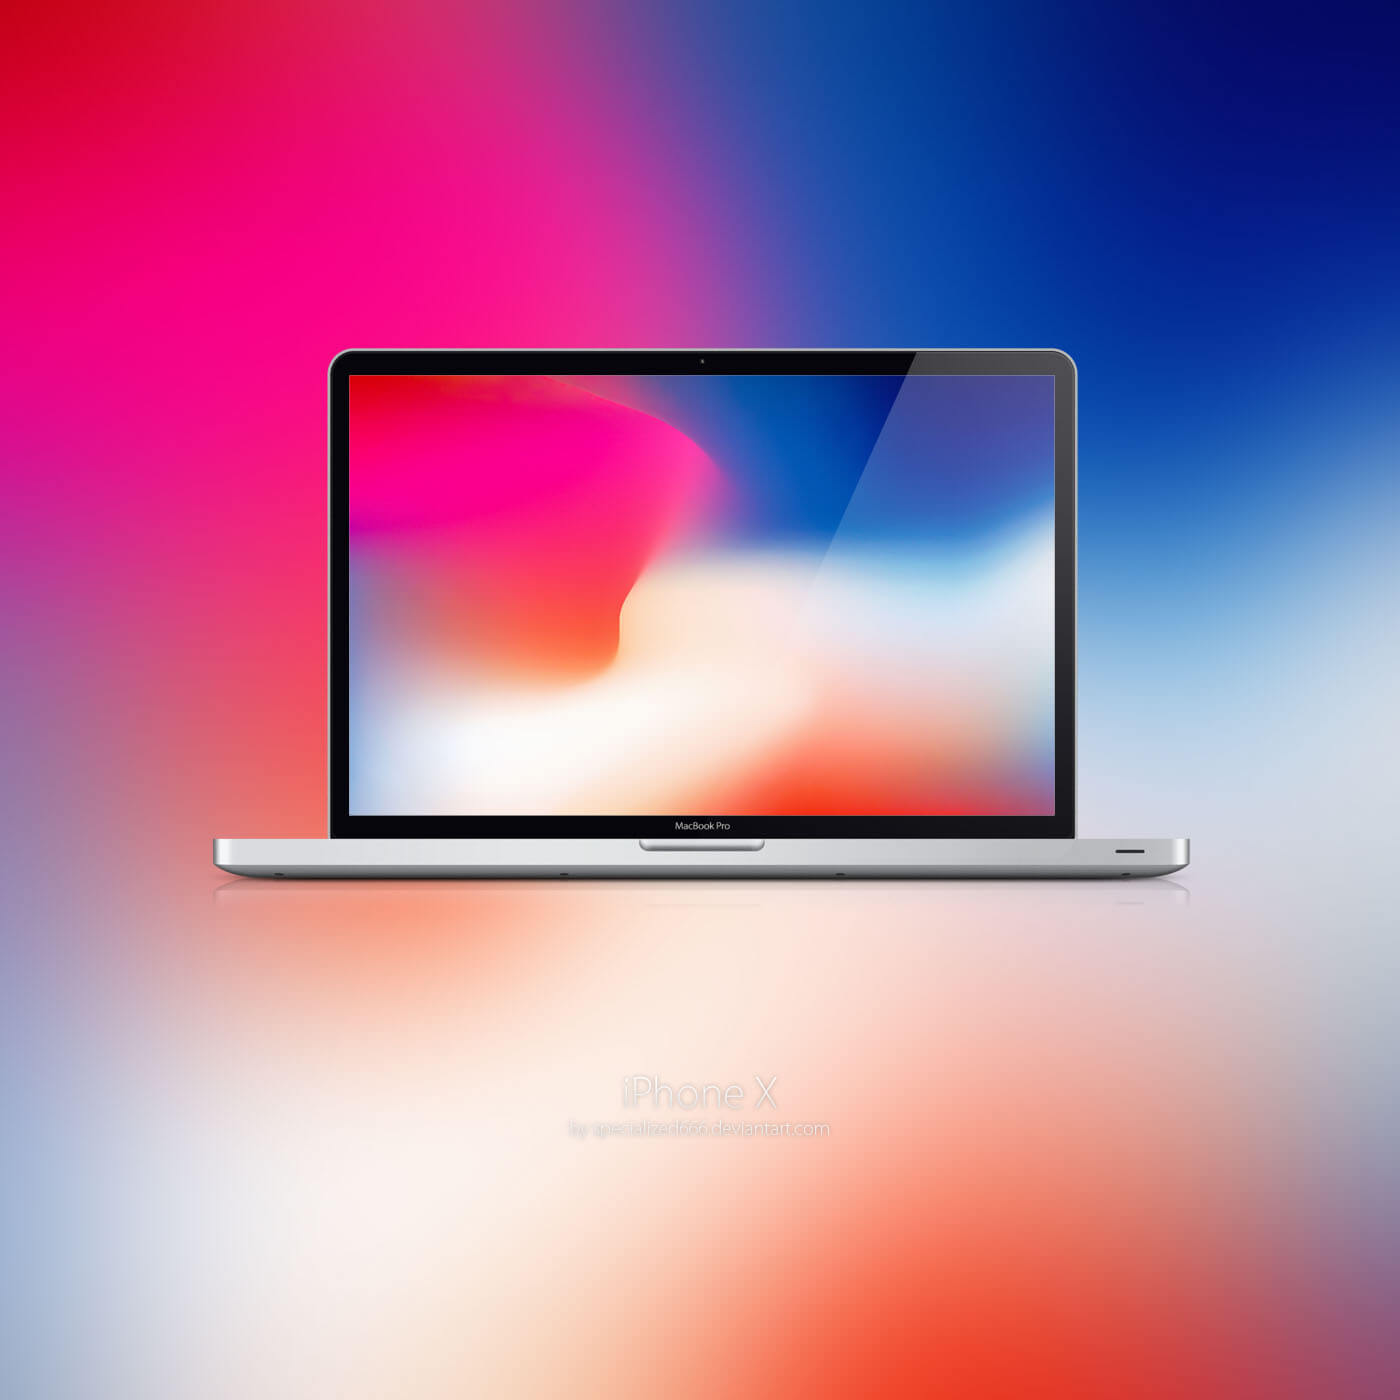 MacOS Mojave / iOS 12 / iMac Pro 苹果全套超高清 5K 壁纸下载-高清, 设计, 美化, 素材, 壁纸, Apple, 5k, 4k